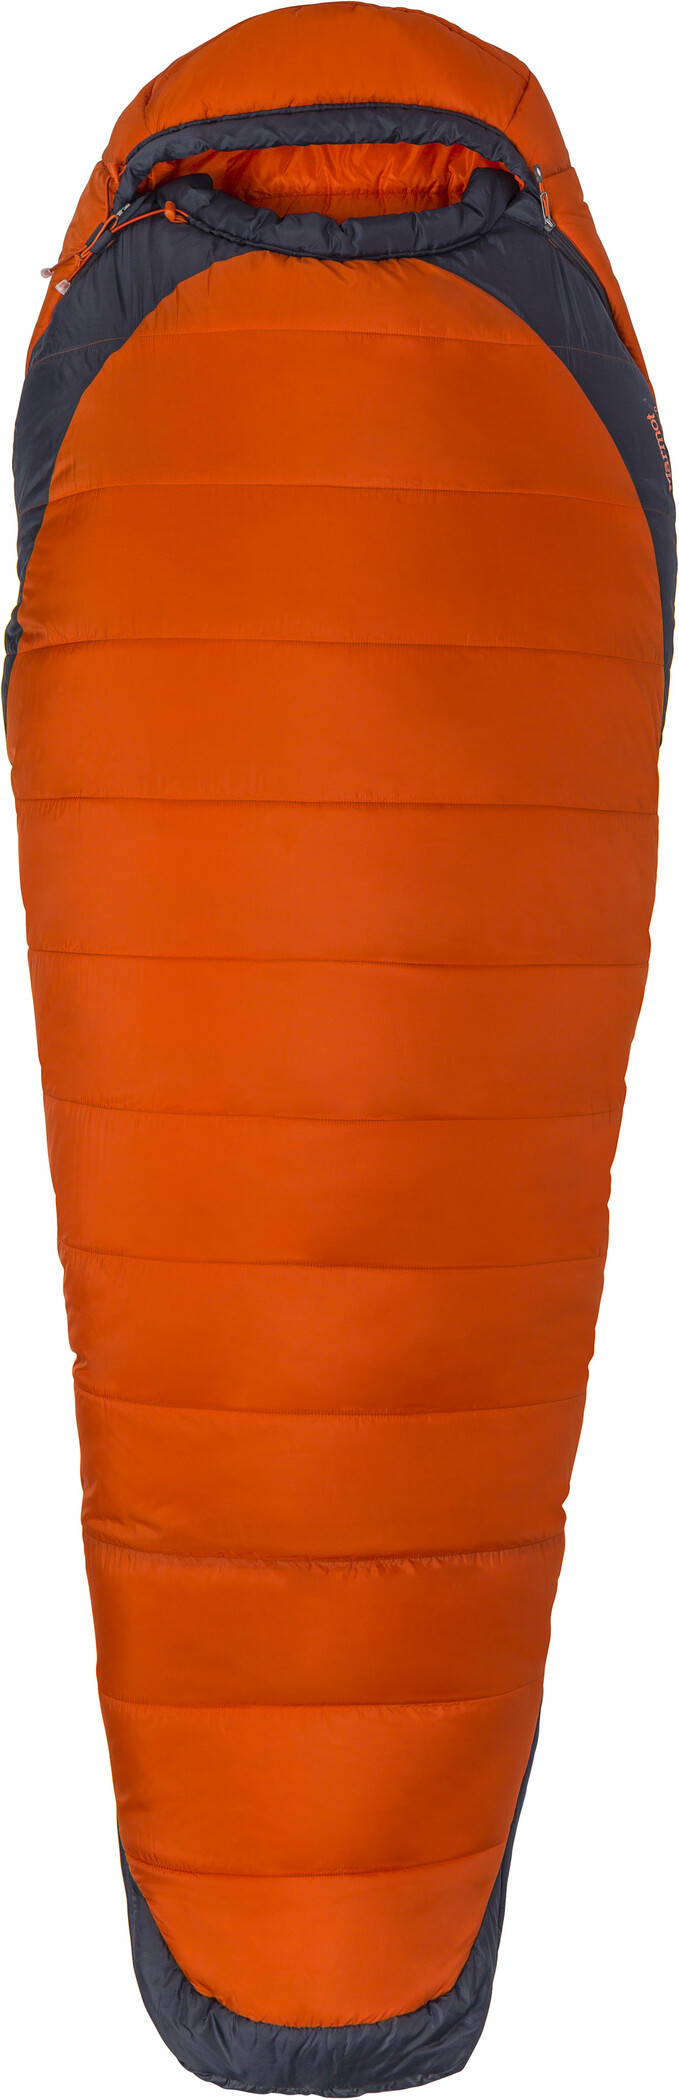 d6d62f075 Marmot_Trestles_Elite_Eco_0_Sleeping_Bag_Long_orange_haze_dark_steel.jpg